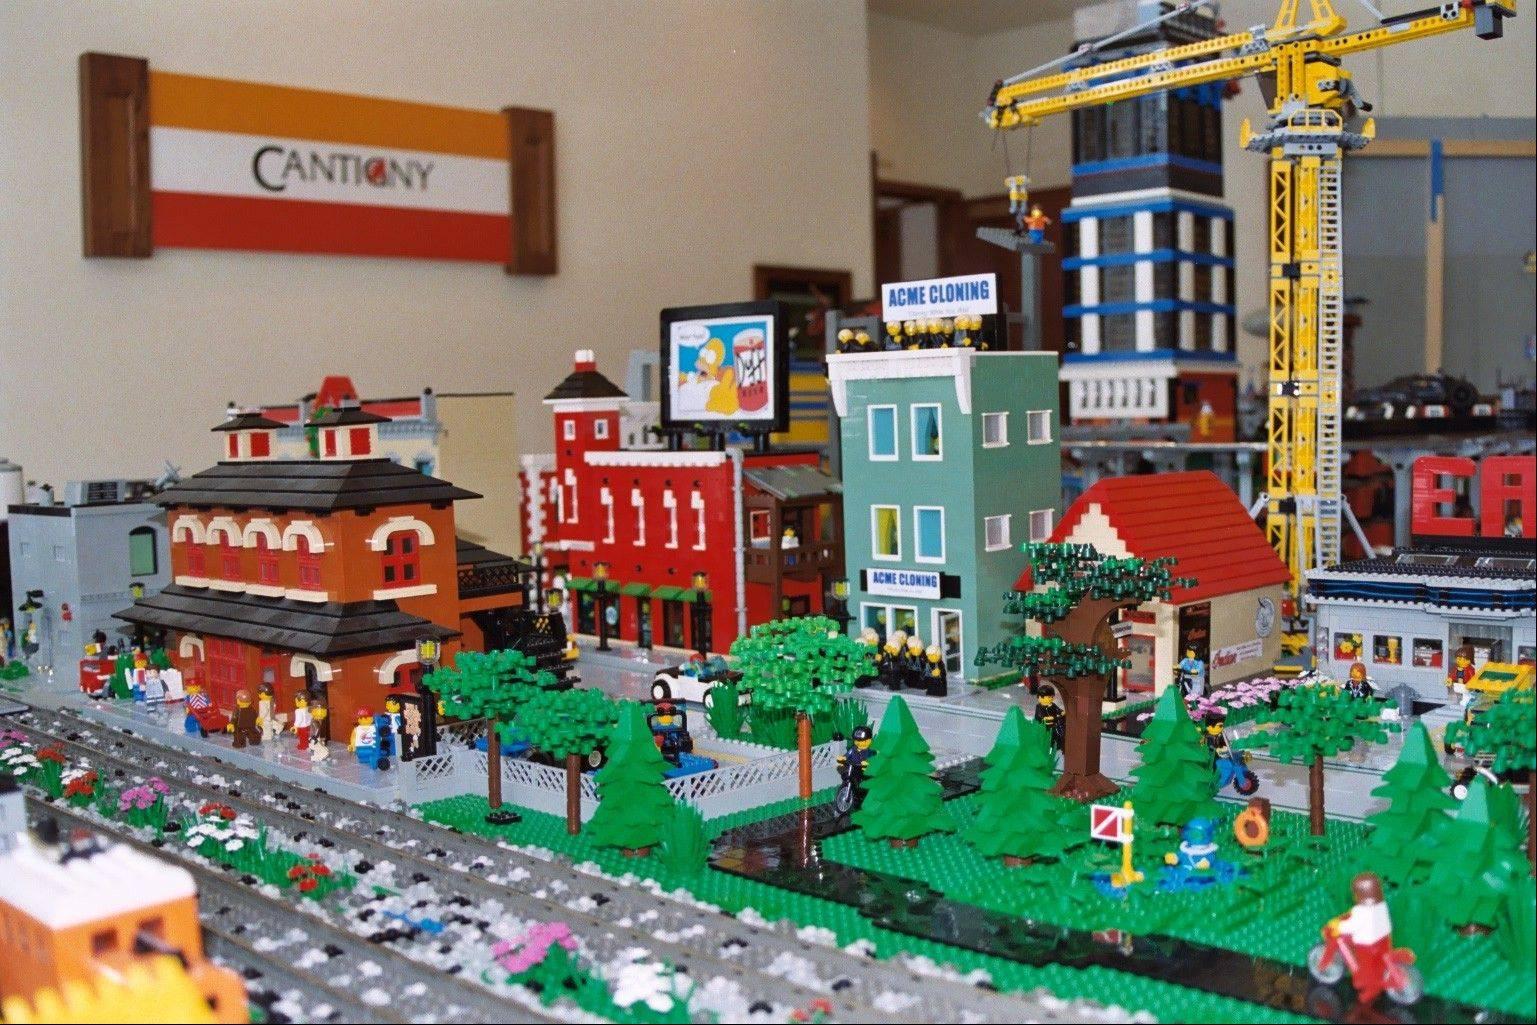 Weekend picks: Holiday Lego Train Show rolls into Cantigny